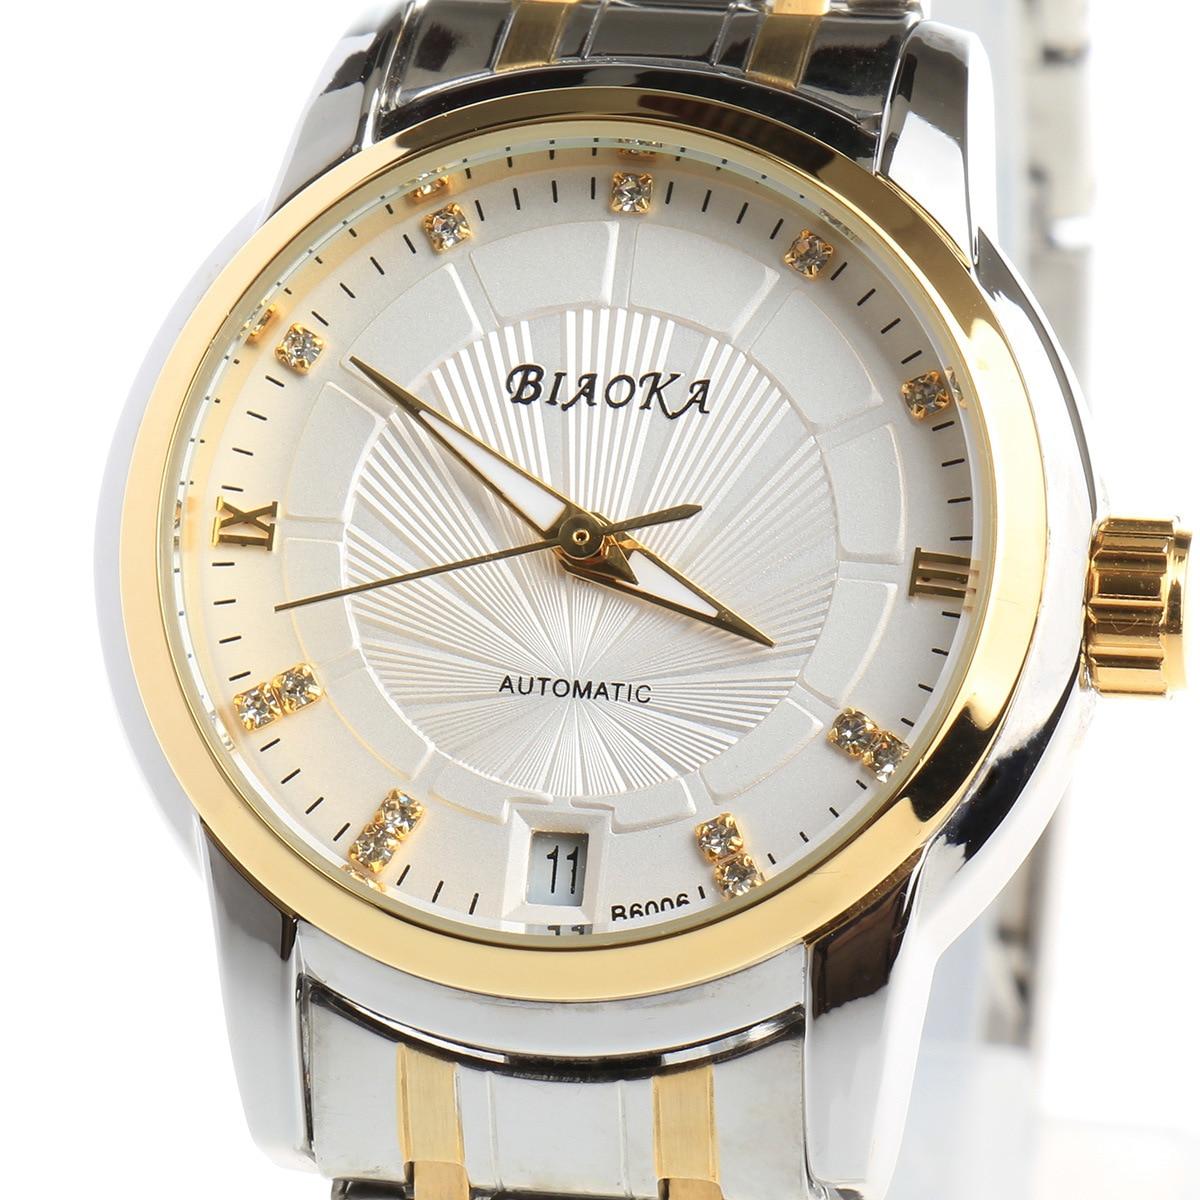 BIAOKA Brand New Fashion Gold Watch Stylish Steel Women Clock Classic Mechanical Dress Skeleton Waterproof Watch Reloj Mujer